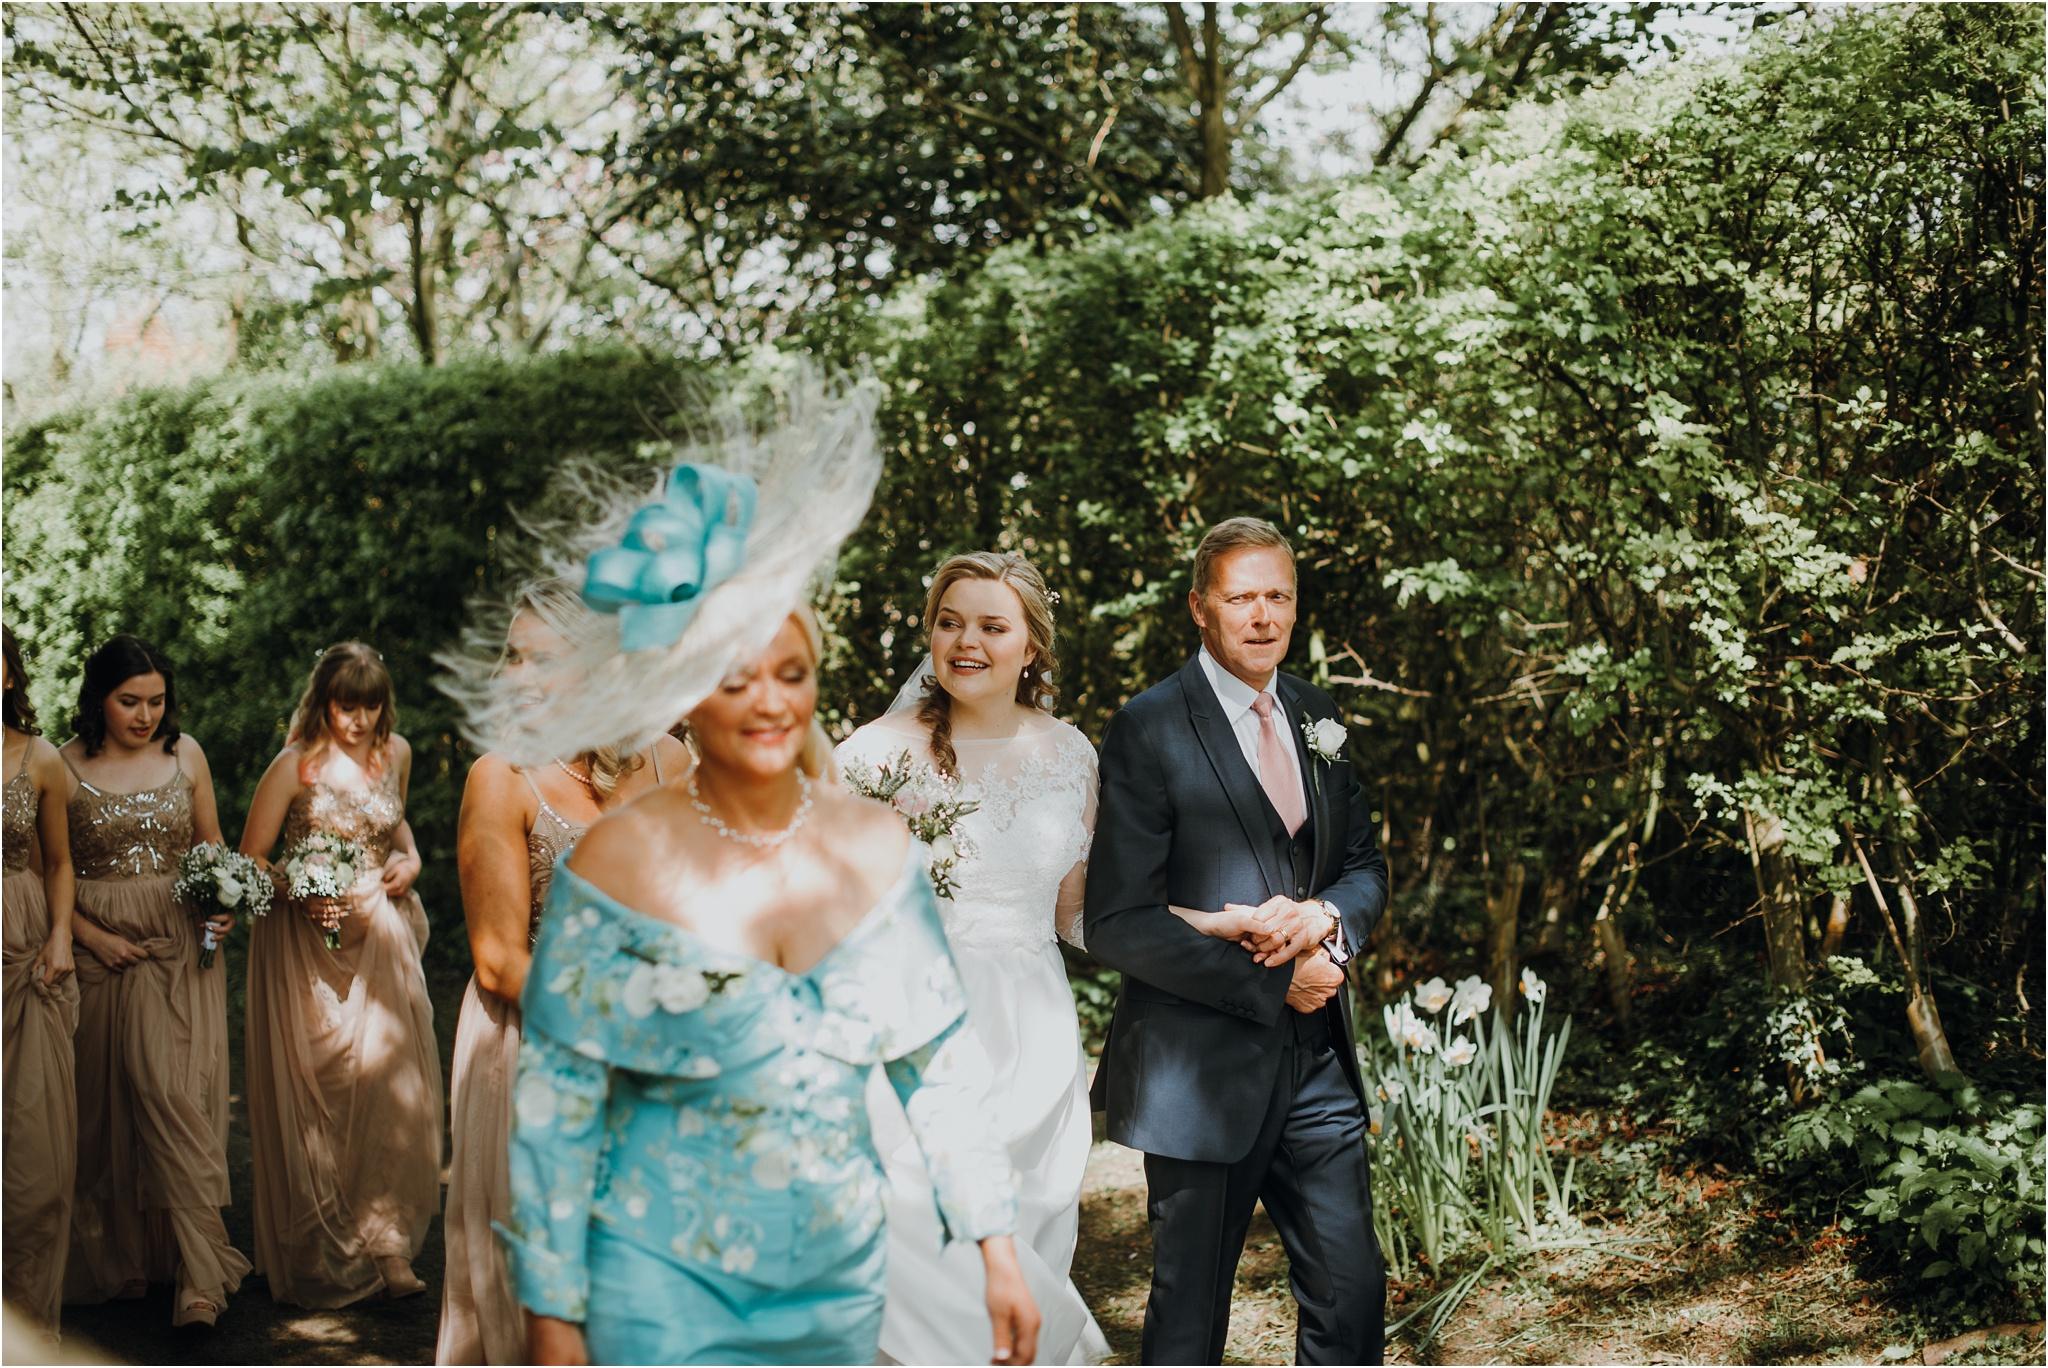 Outdoor-country-wedding-Edinburgh-photographer__0060.jpg